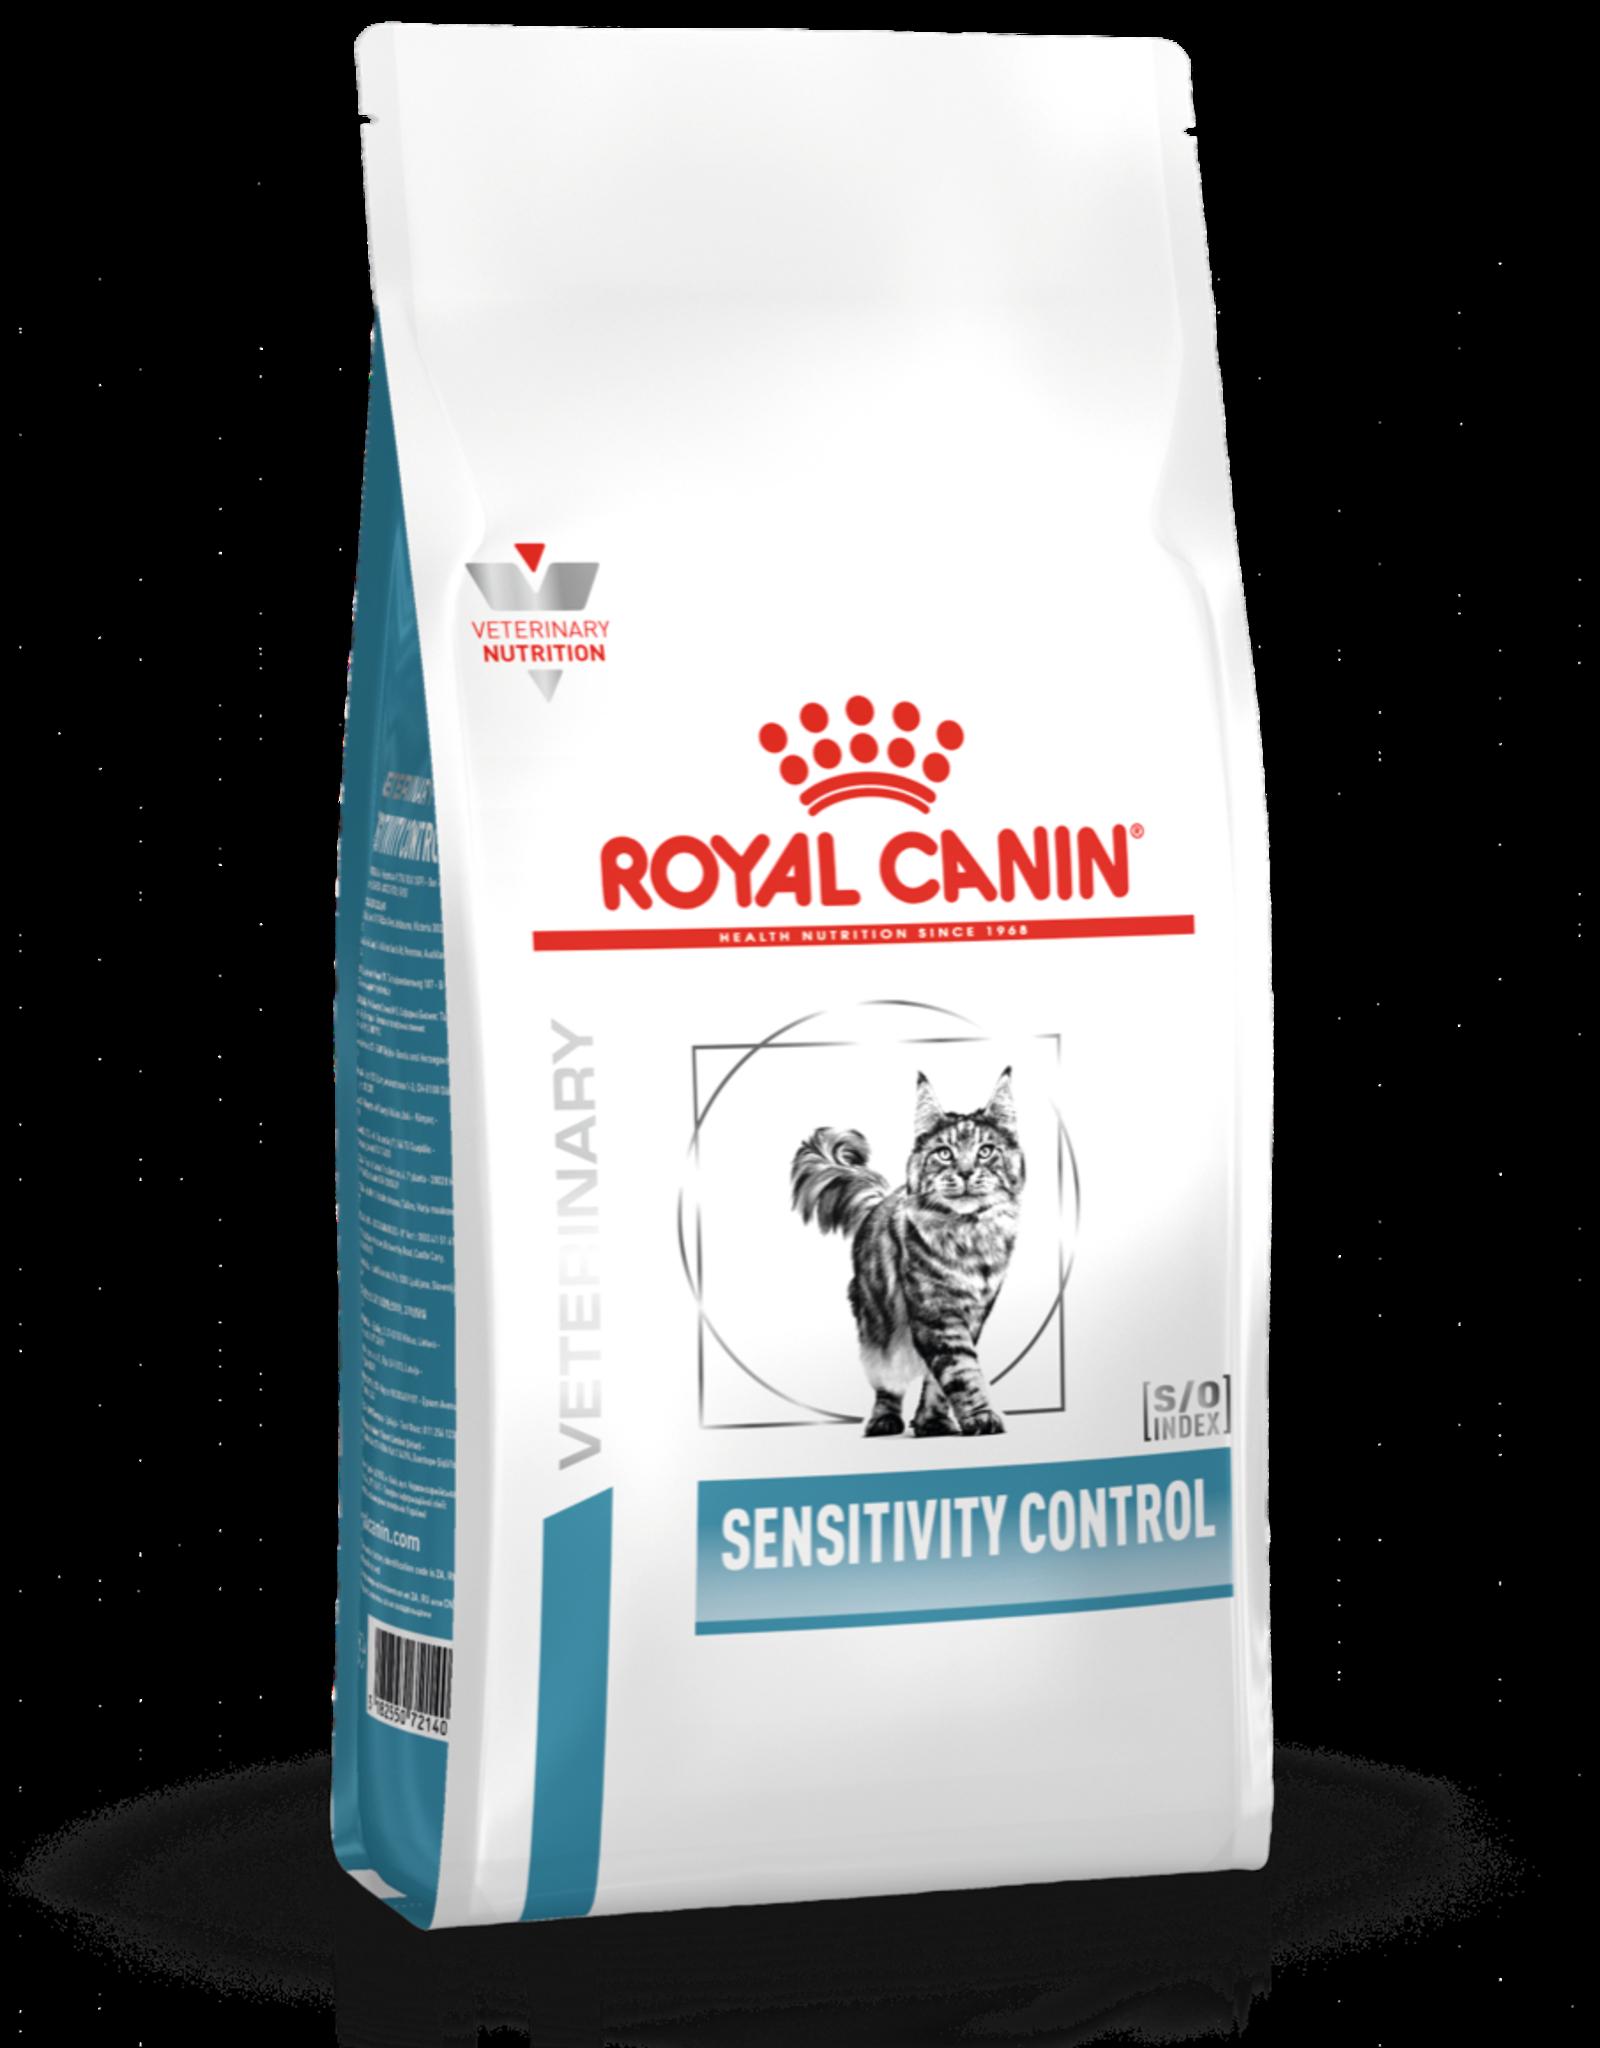 Royal Canin Royal Canin Sensitivity Control Kat Eend 3,5kg